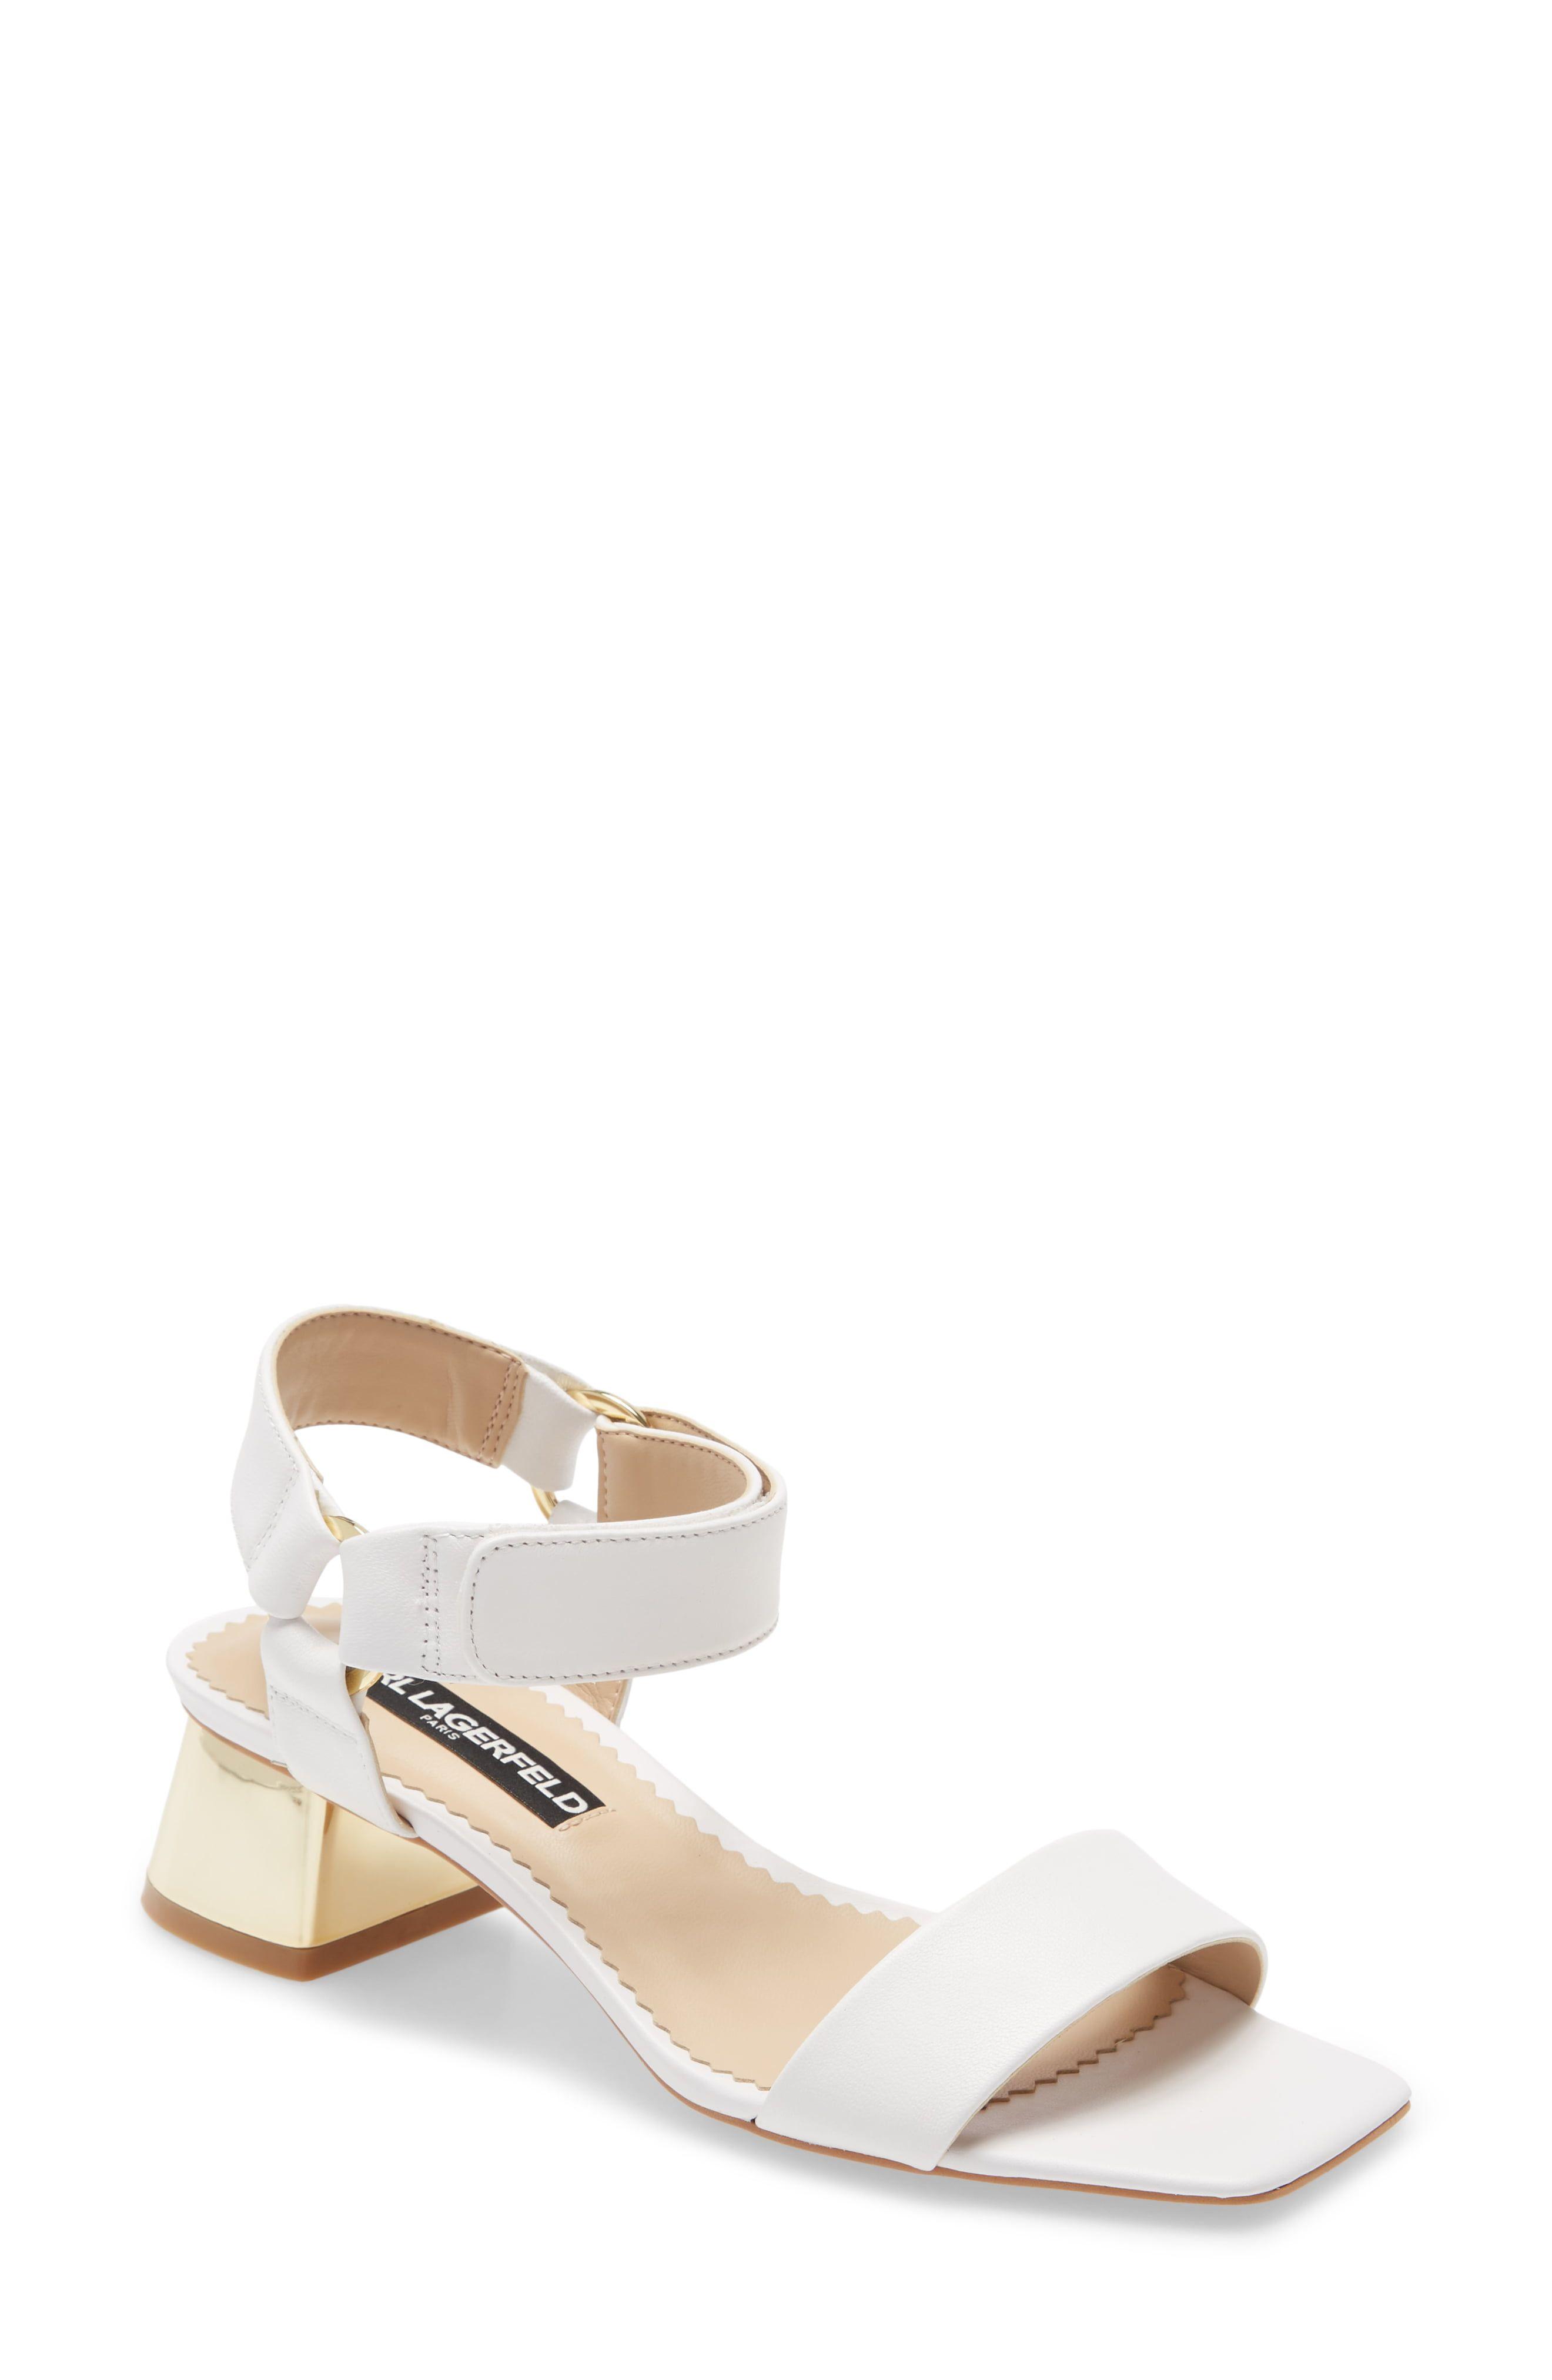 Karl Lagerfeld Paris Morico Square Toe Sandal Women In 2020 Karl Lagerfeld Sandals Kitten Heels